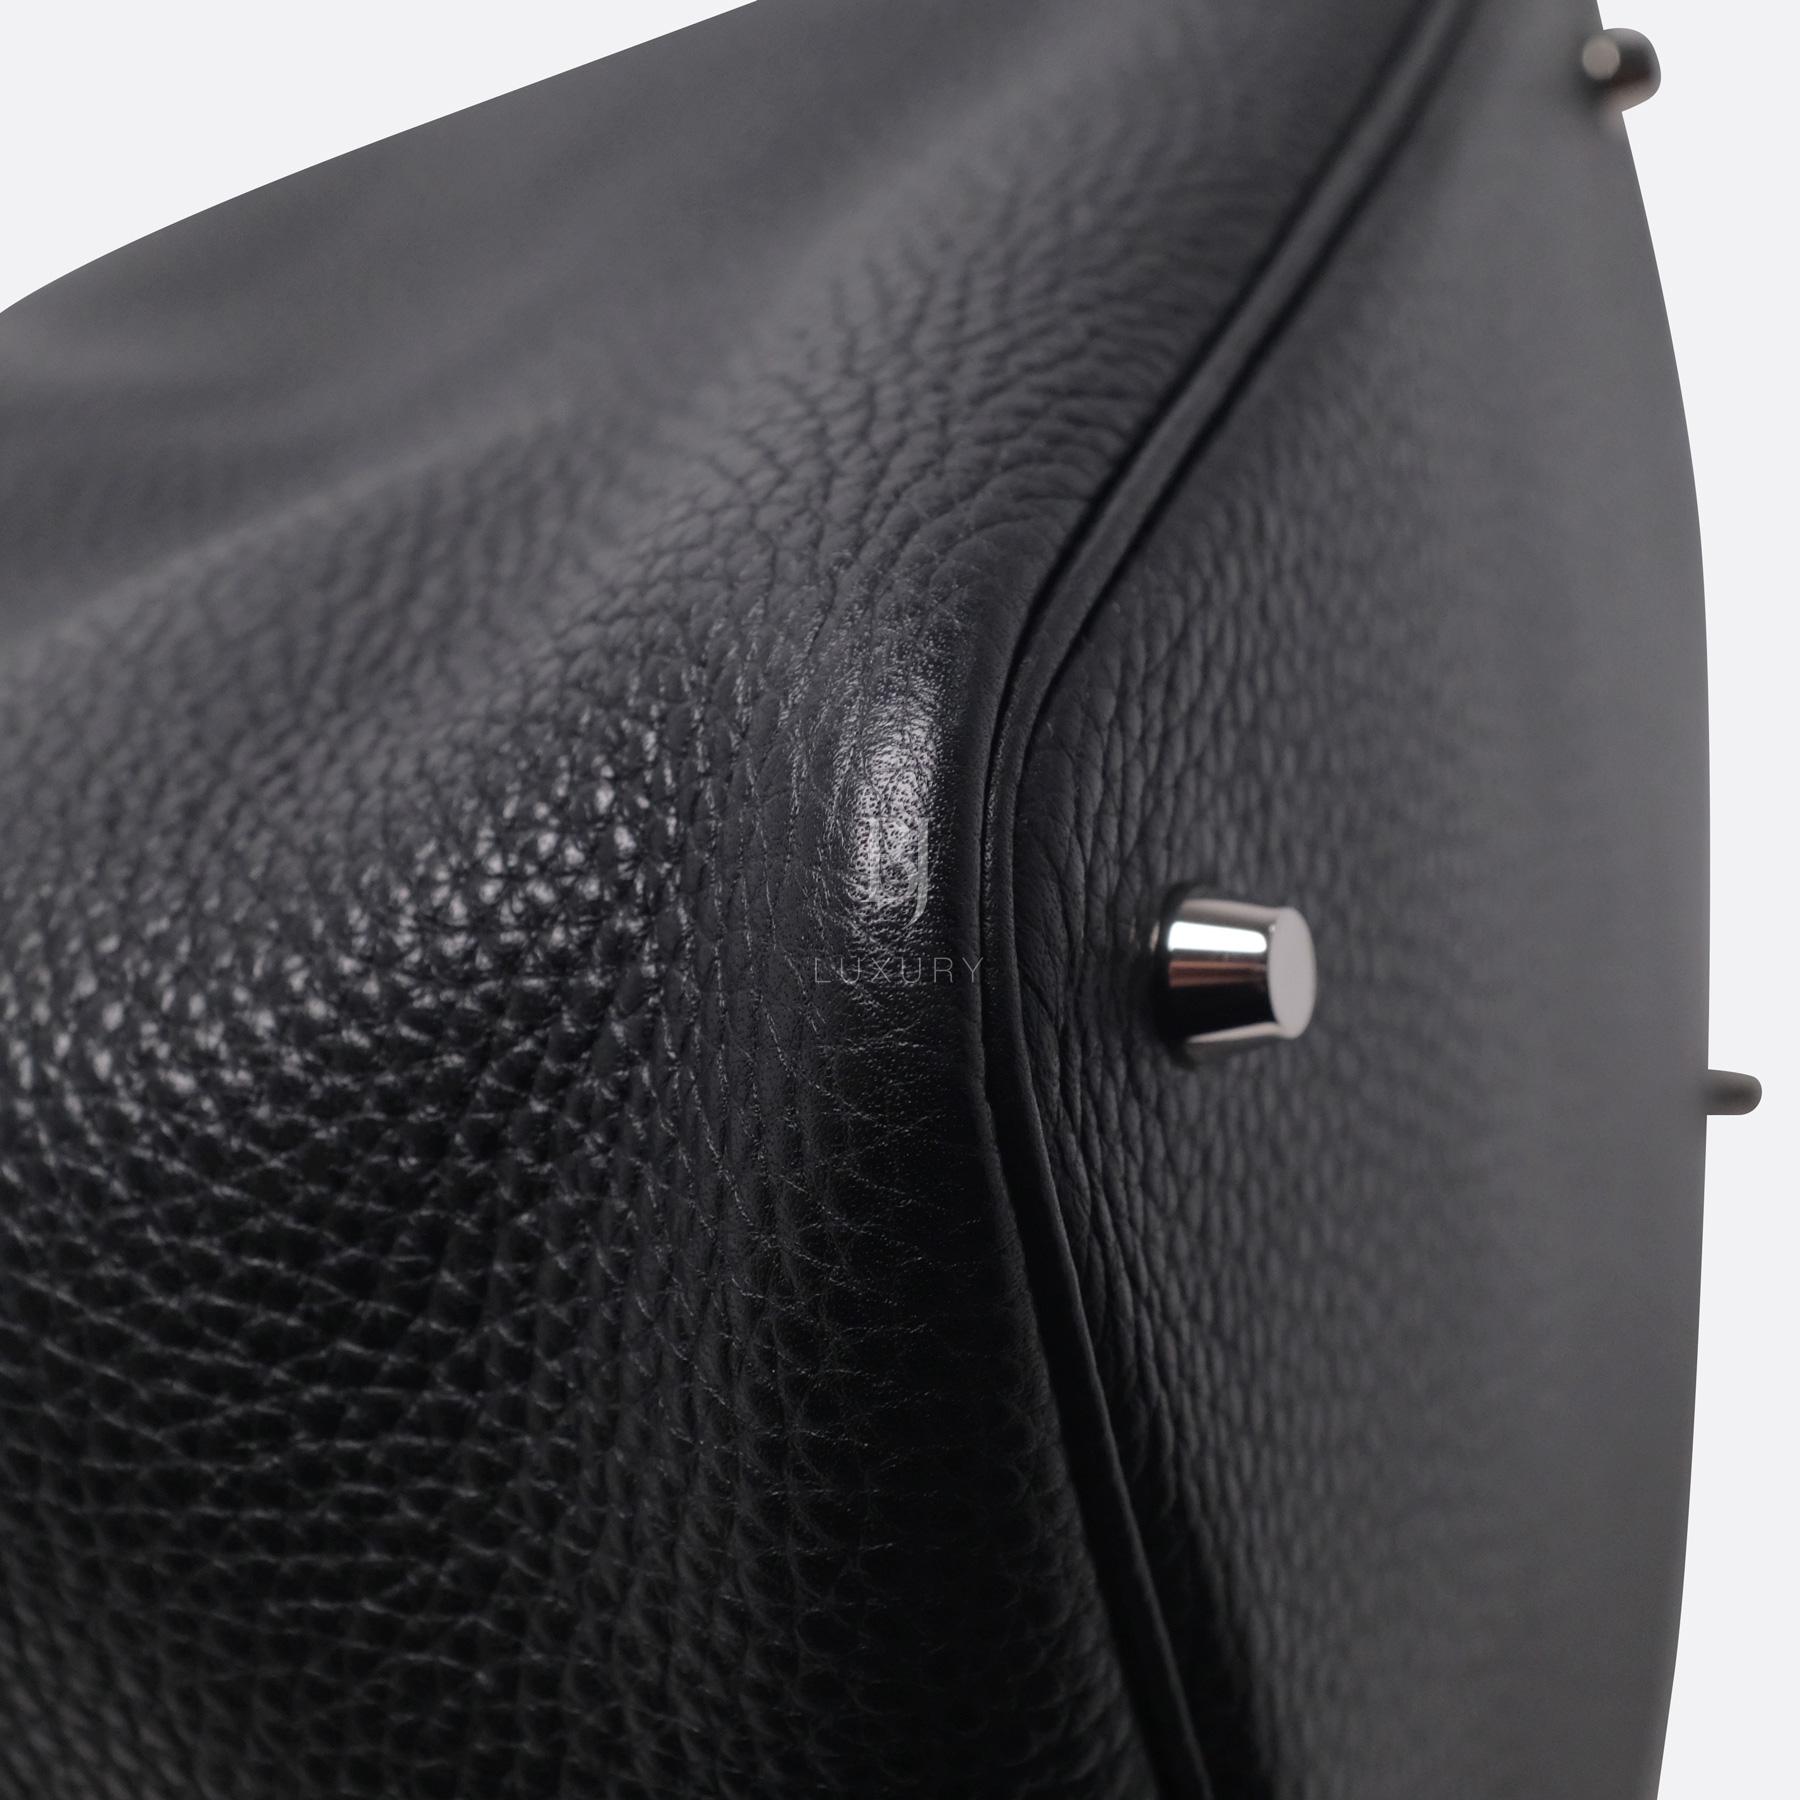 Hermes Picotin 22 Palladium Clemence BJ Luxury 9.jpg